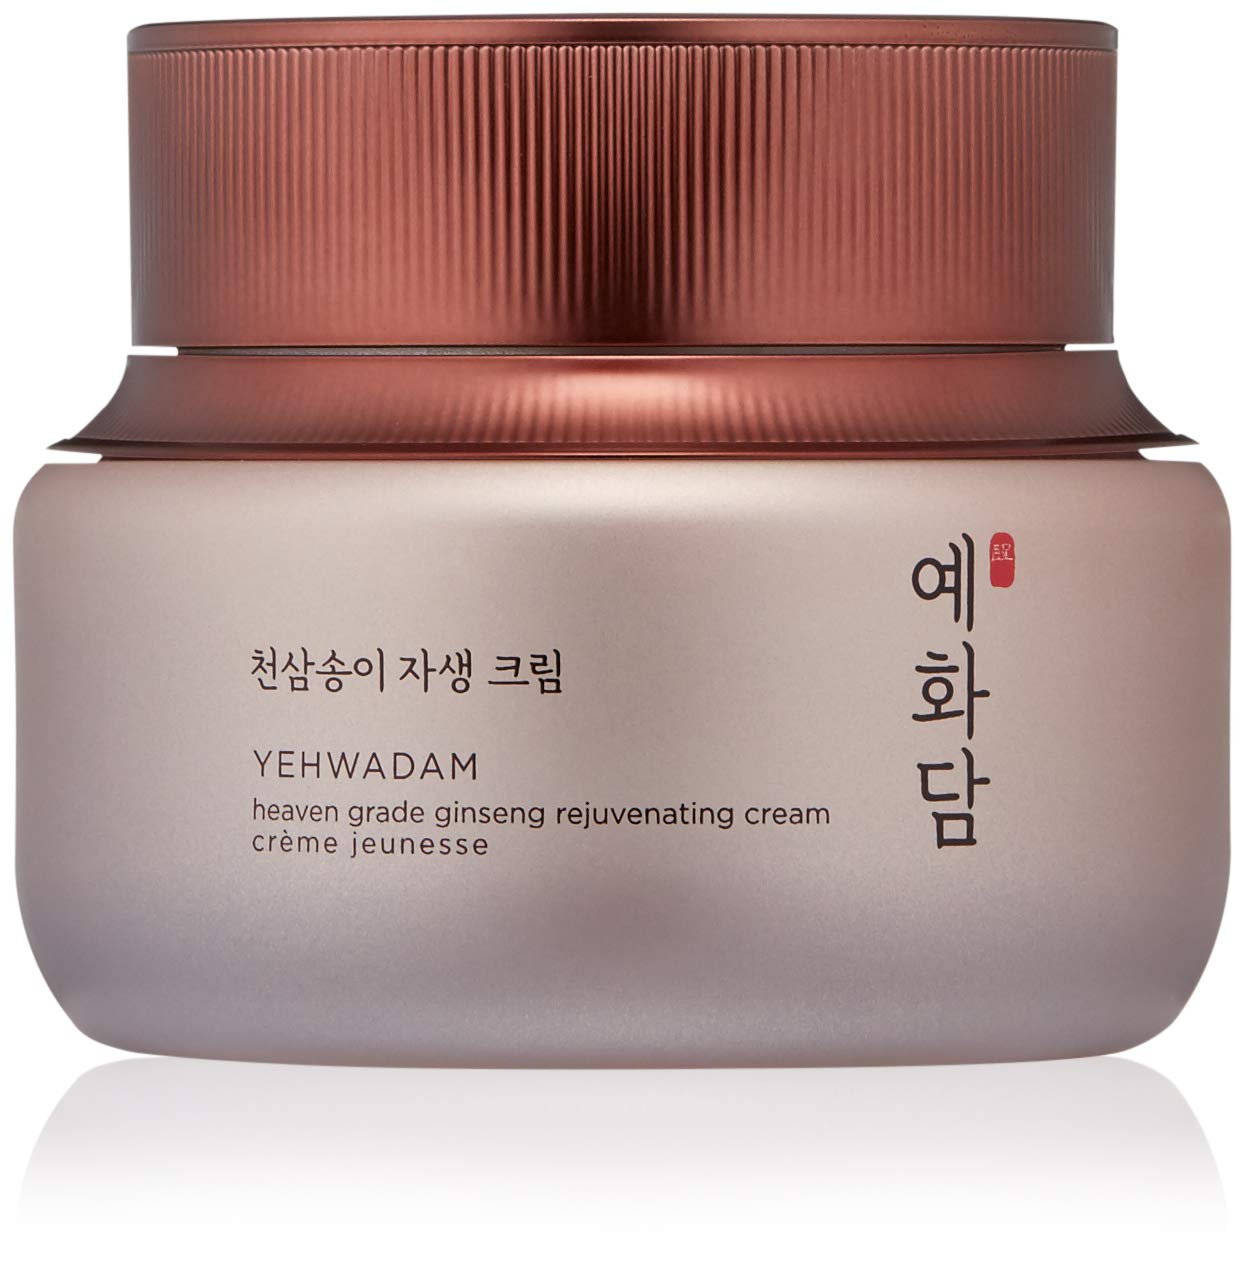 The Face Shop Yehwadam Heaven Grade Ginseng Rejuvenating Cream.19r, 20 G.